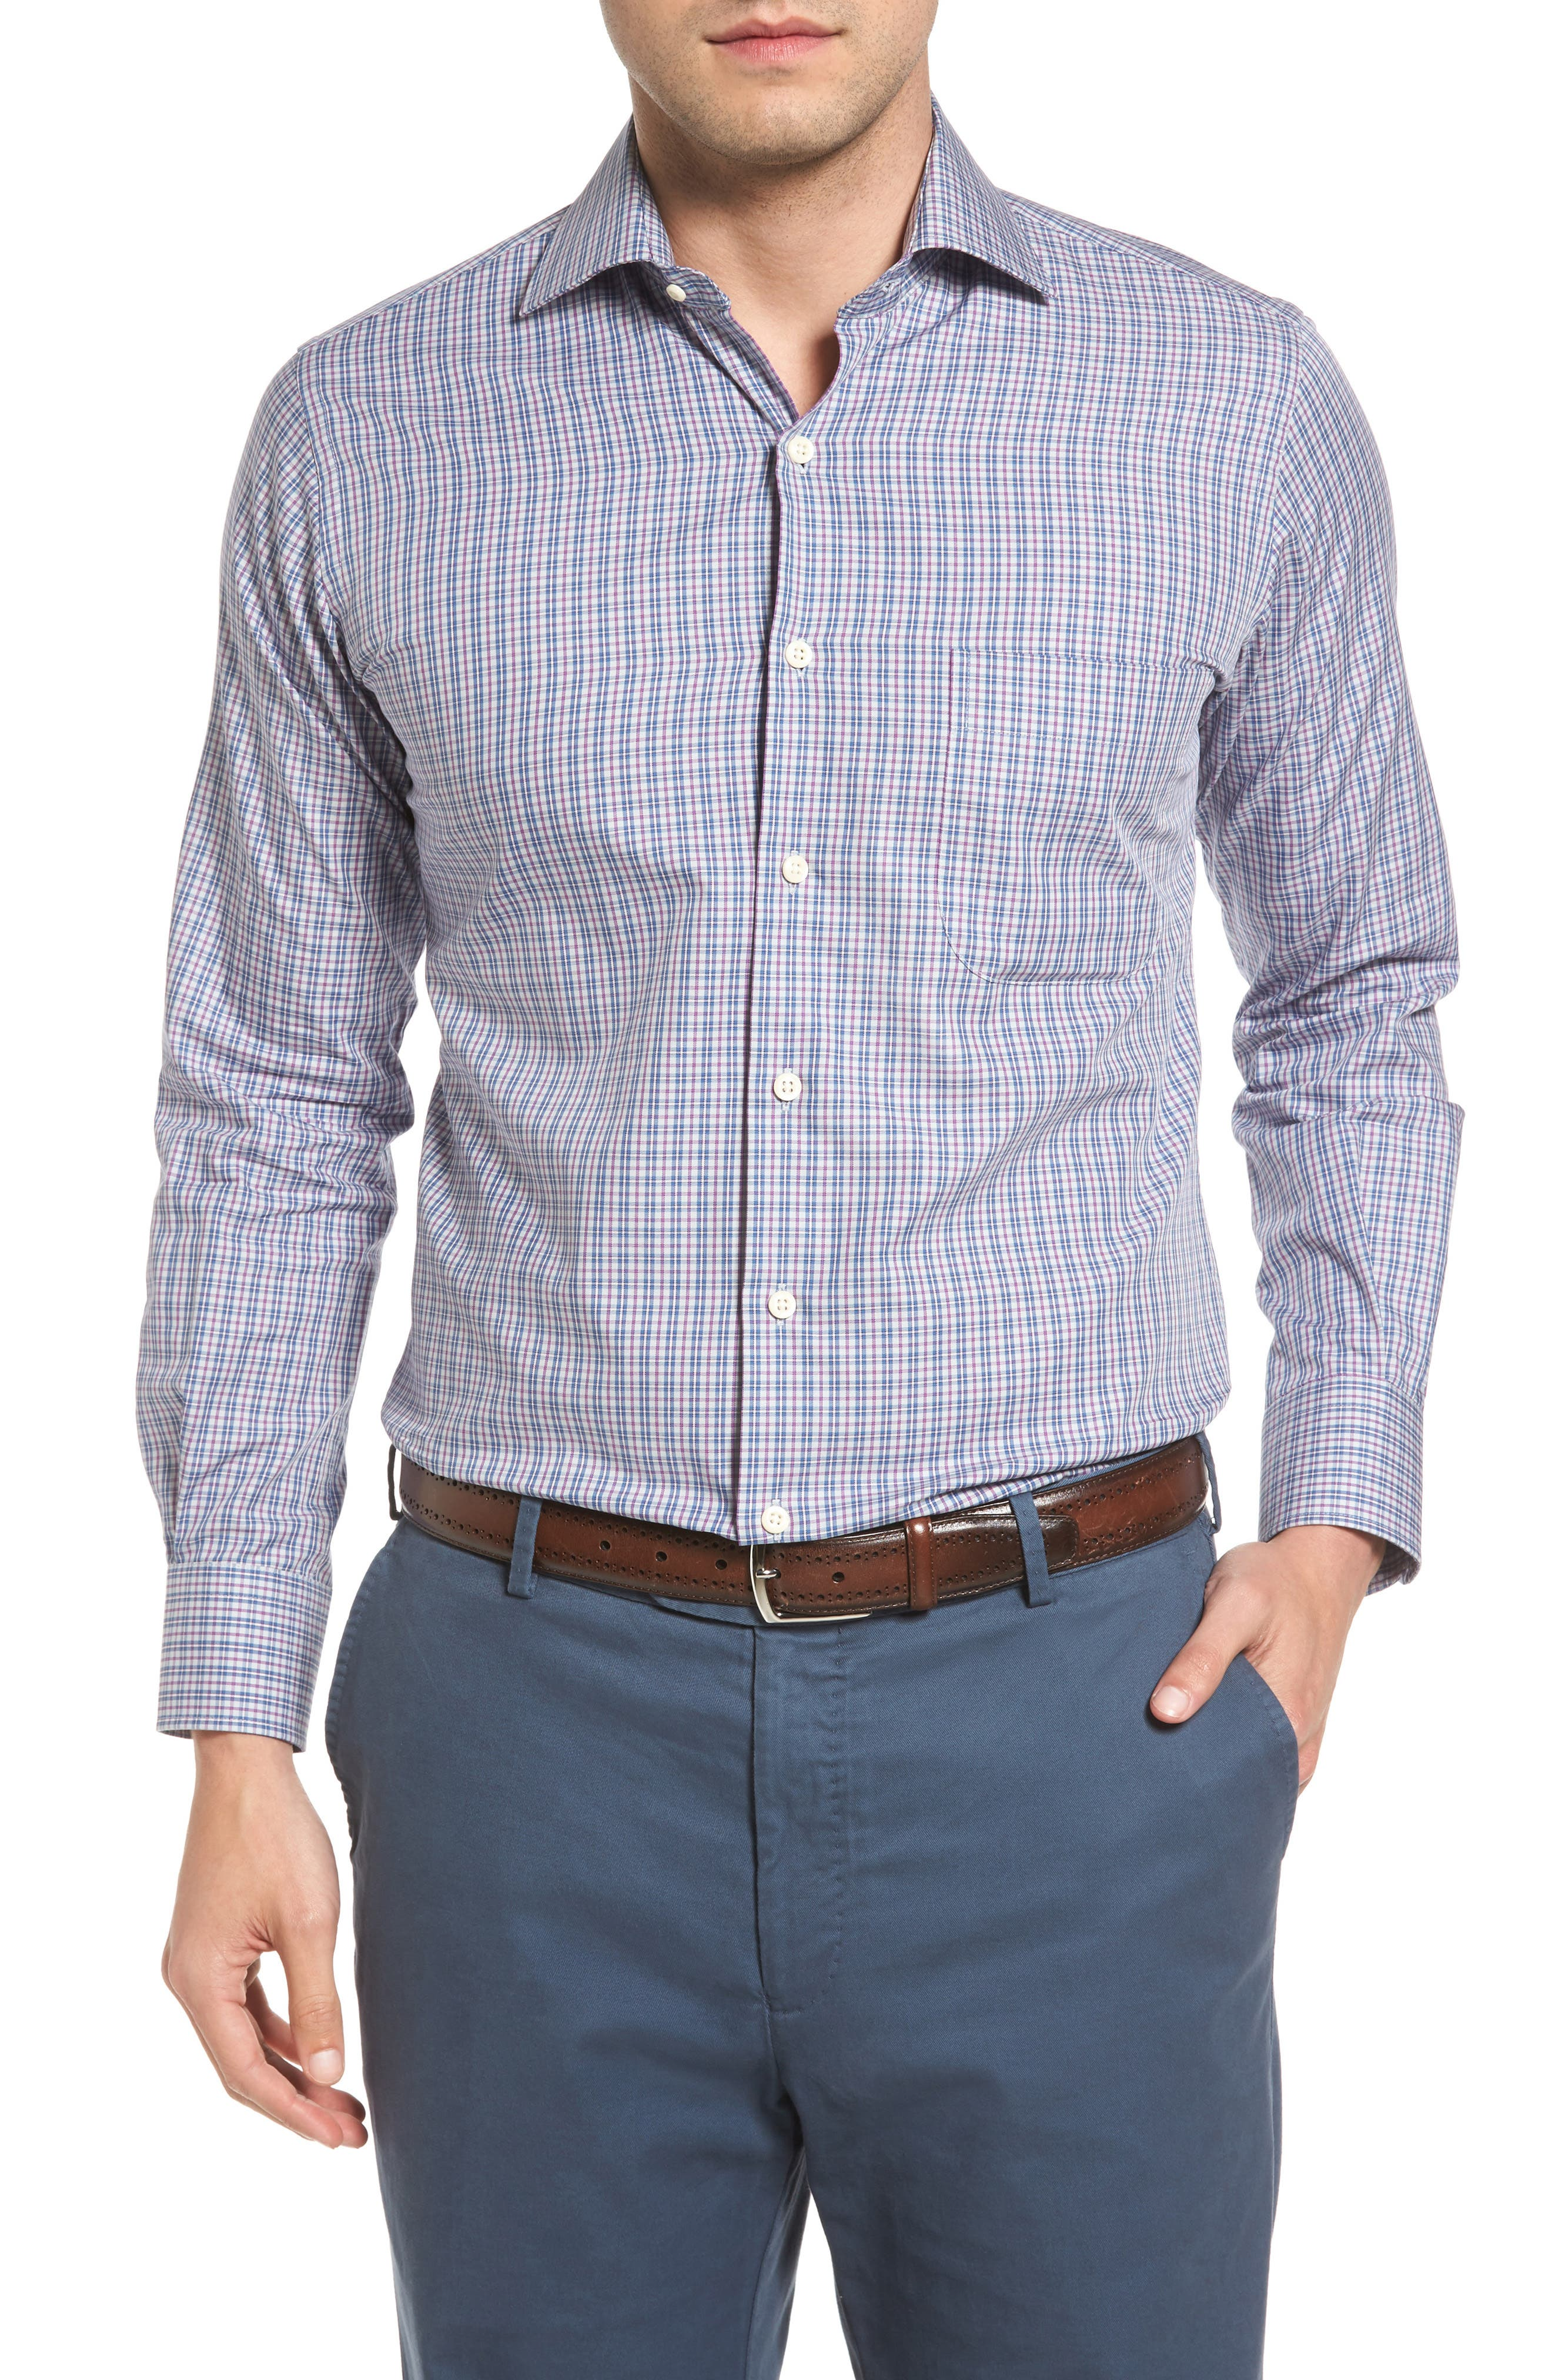 Hillock Plaid Regular Fit Sport Shirt,                             Main thumbnail 1, color,                             Stingray